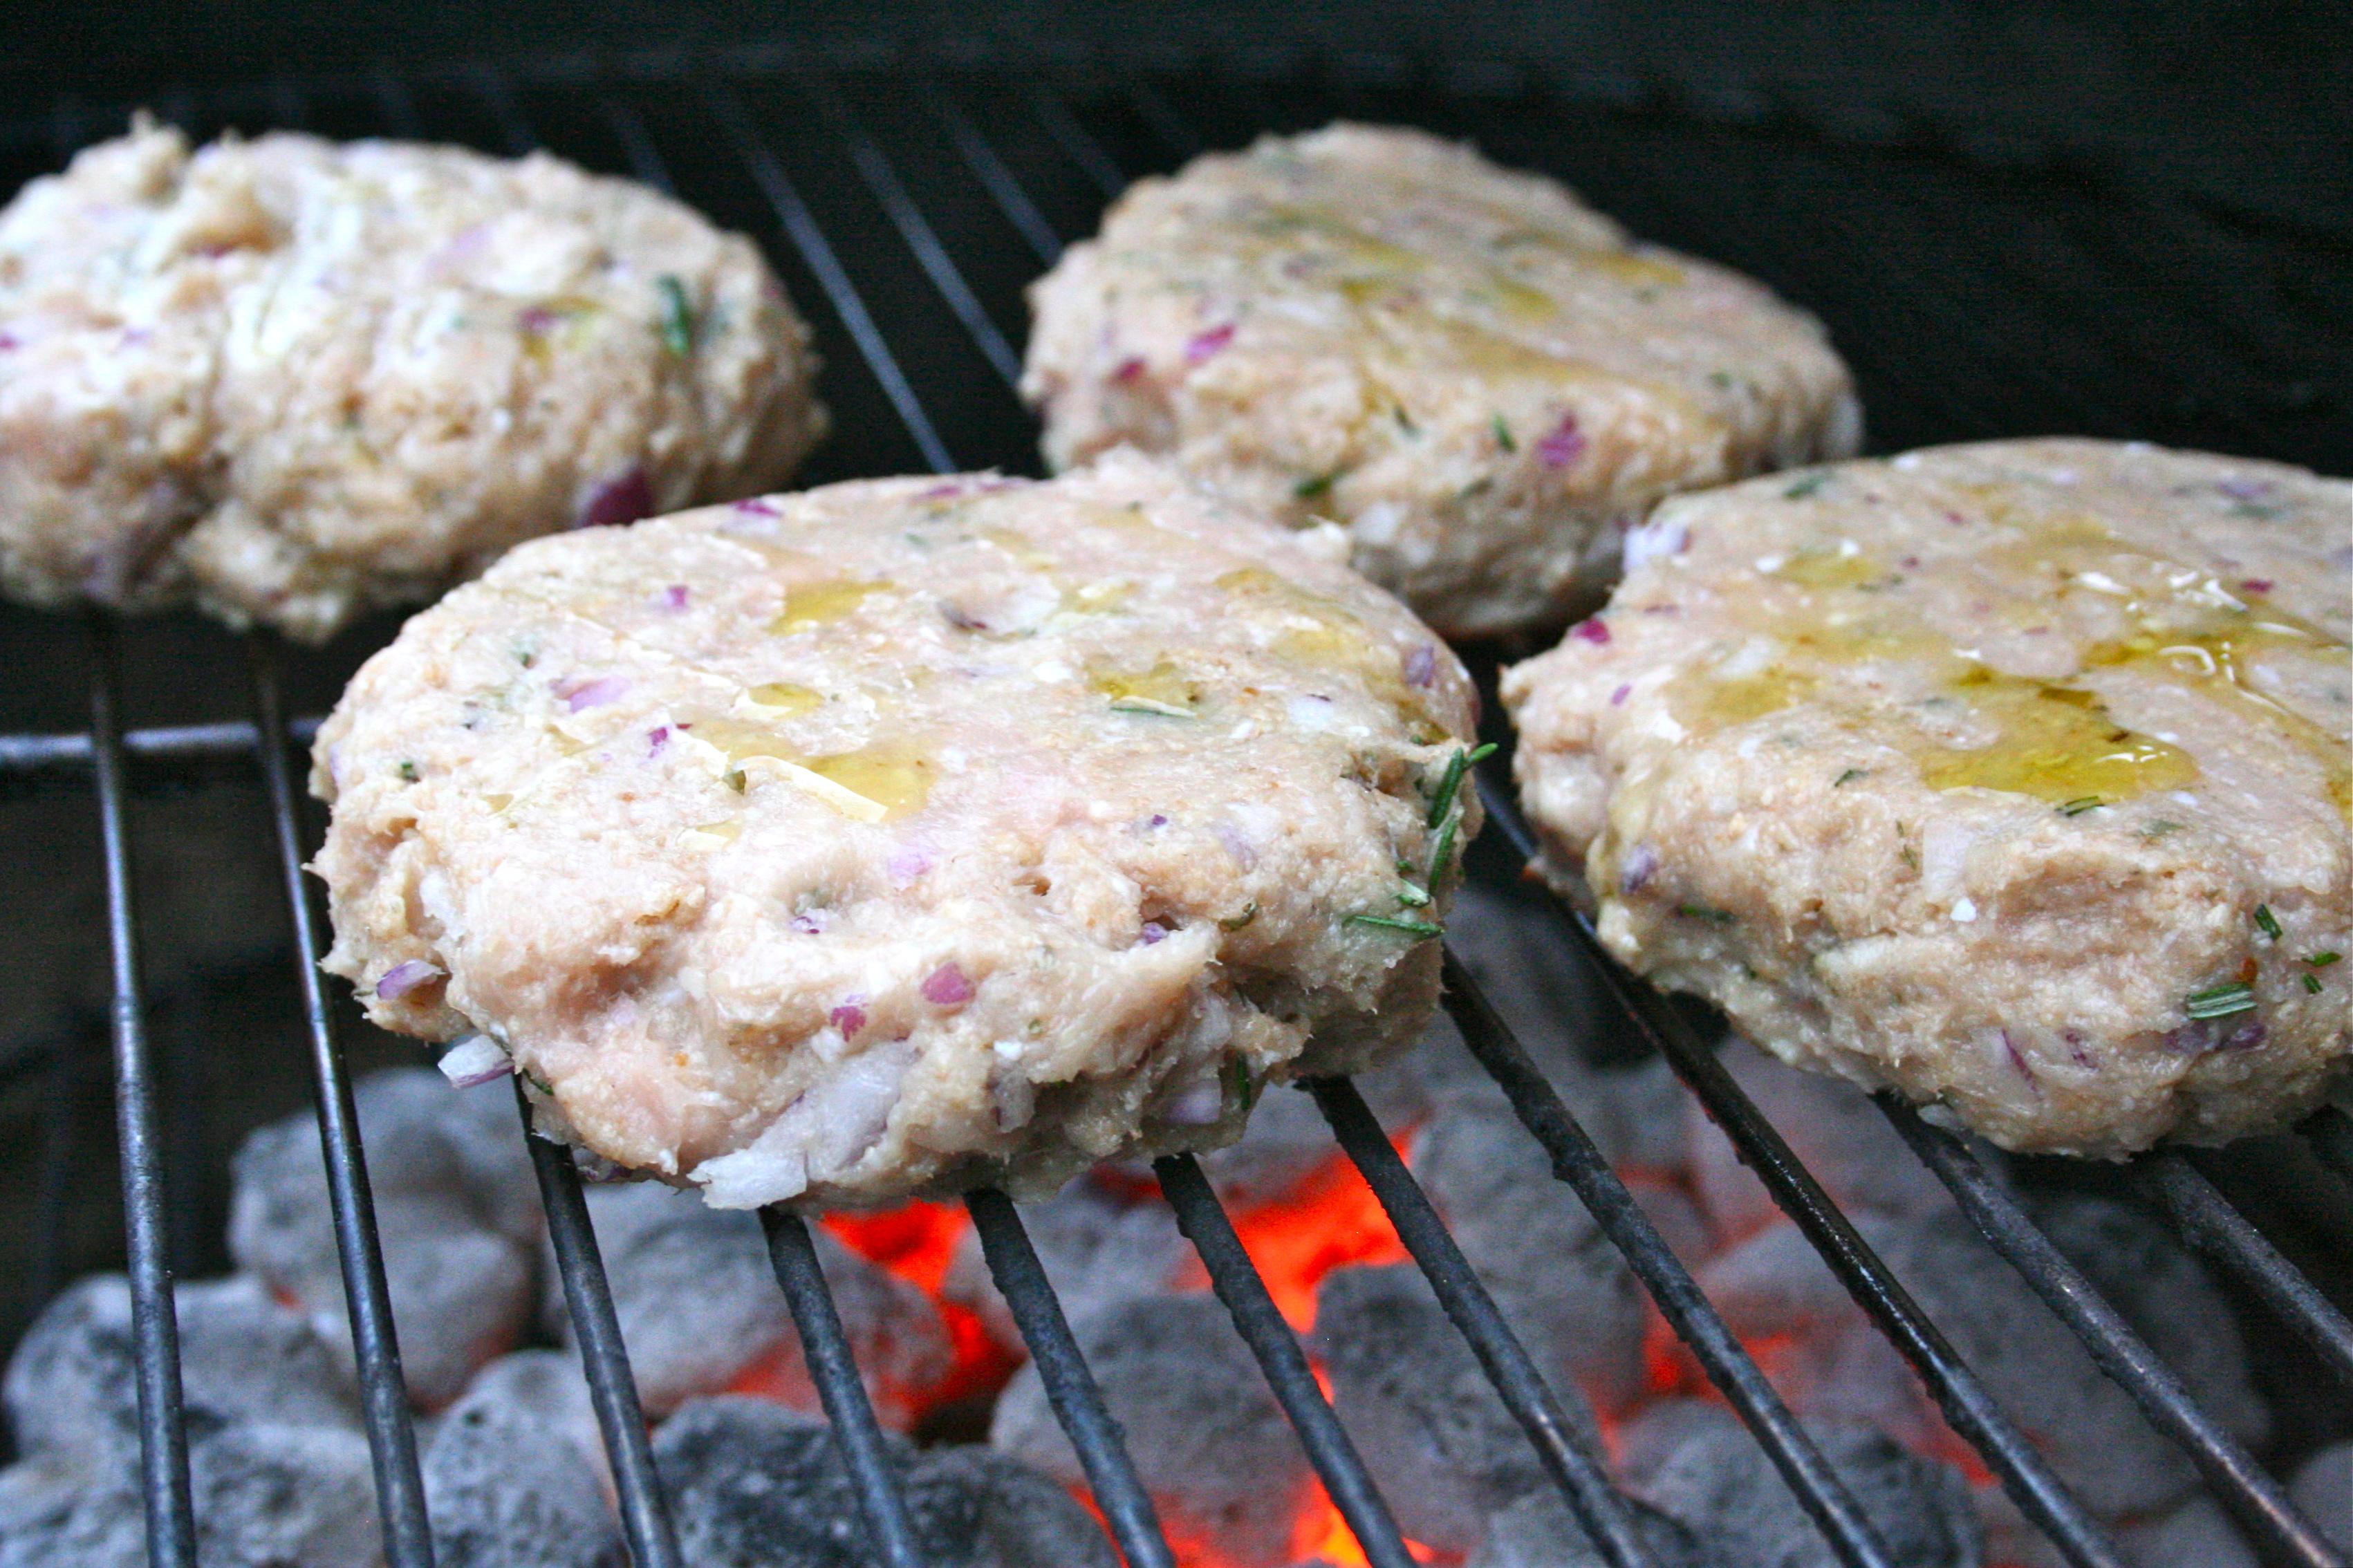 rosemary turkey burgers with meyer lemon aioli | whisking life away